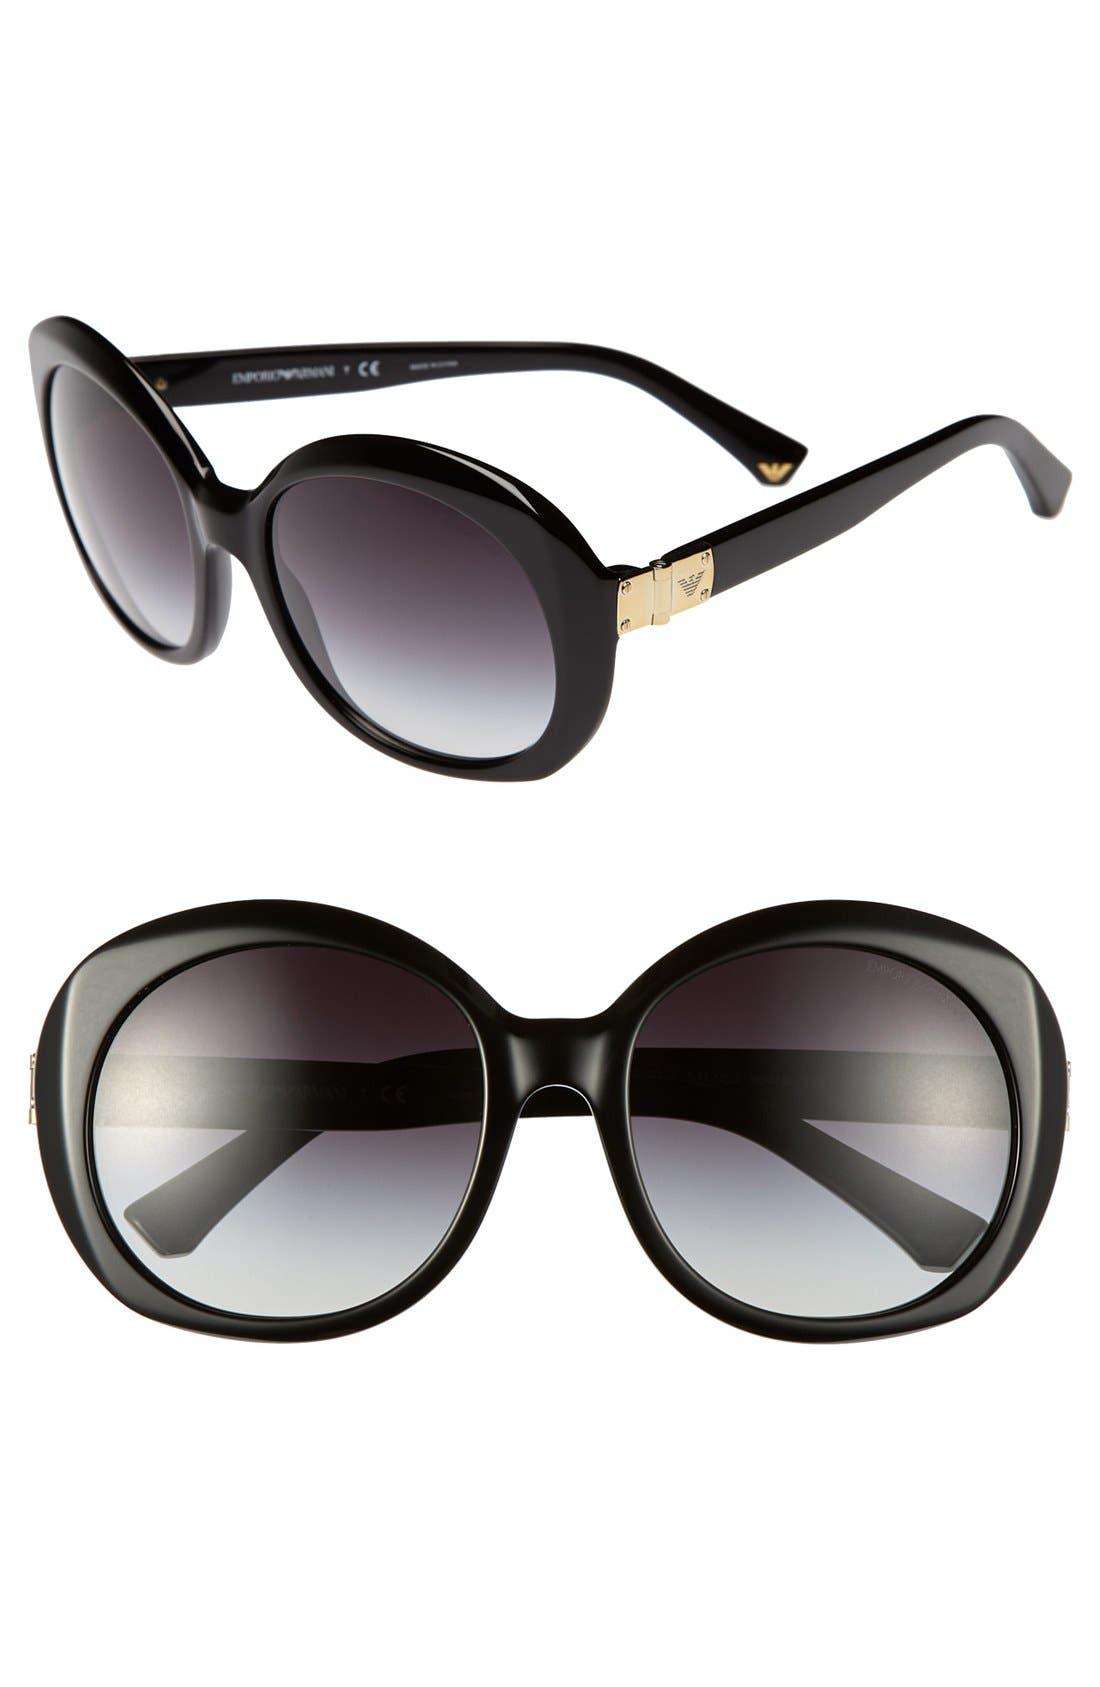 Alternate Image 1 Selected - Emporio Armani 56mm Sunglasses